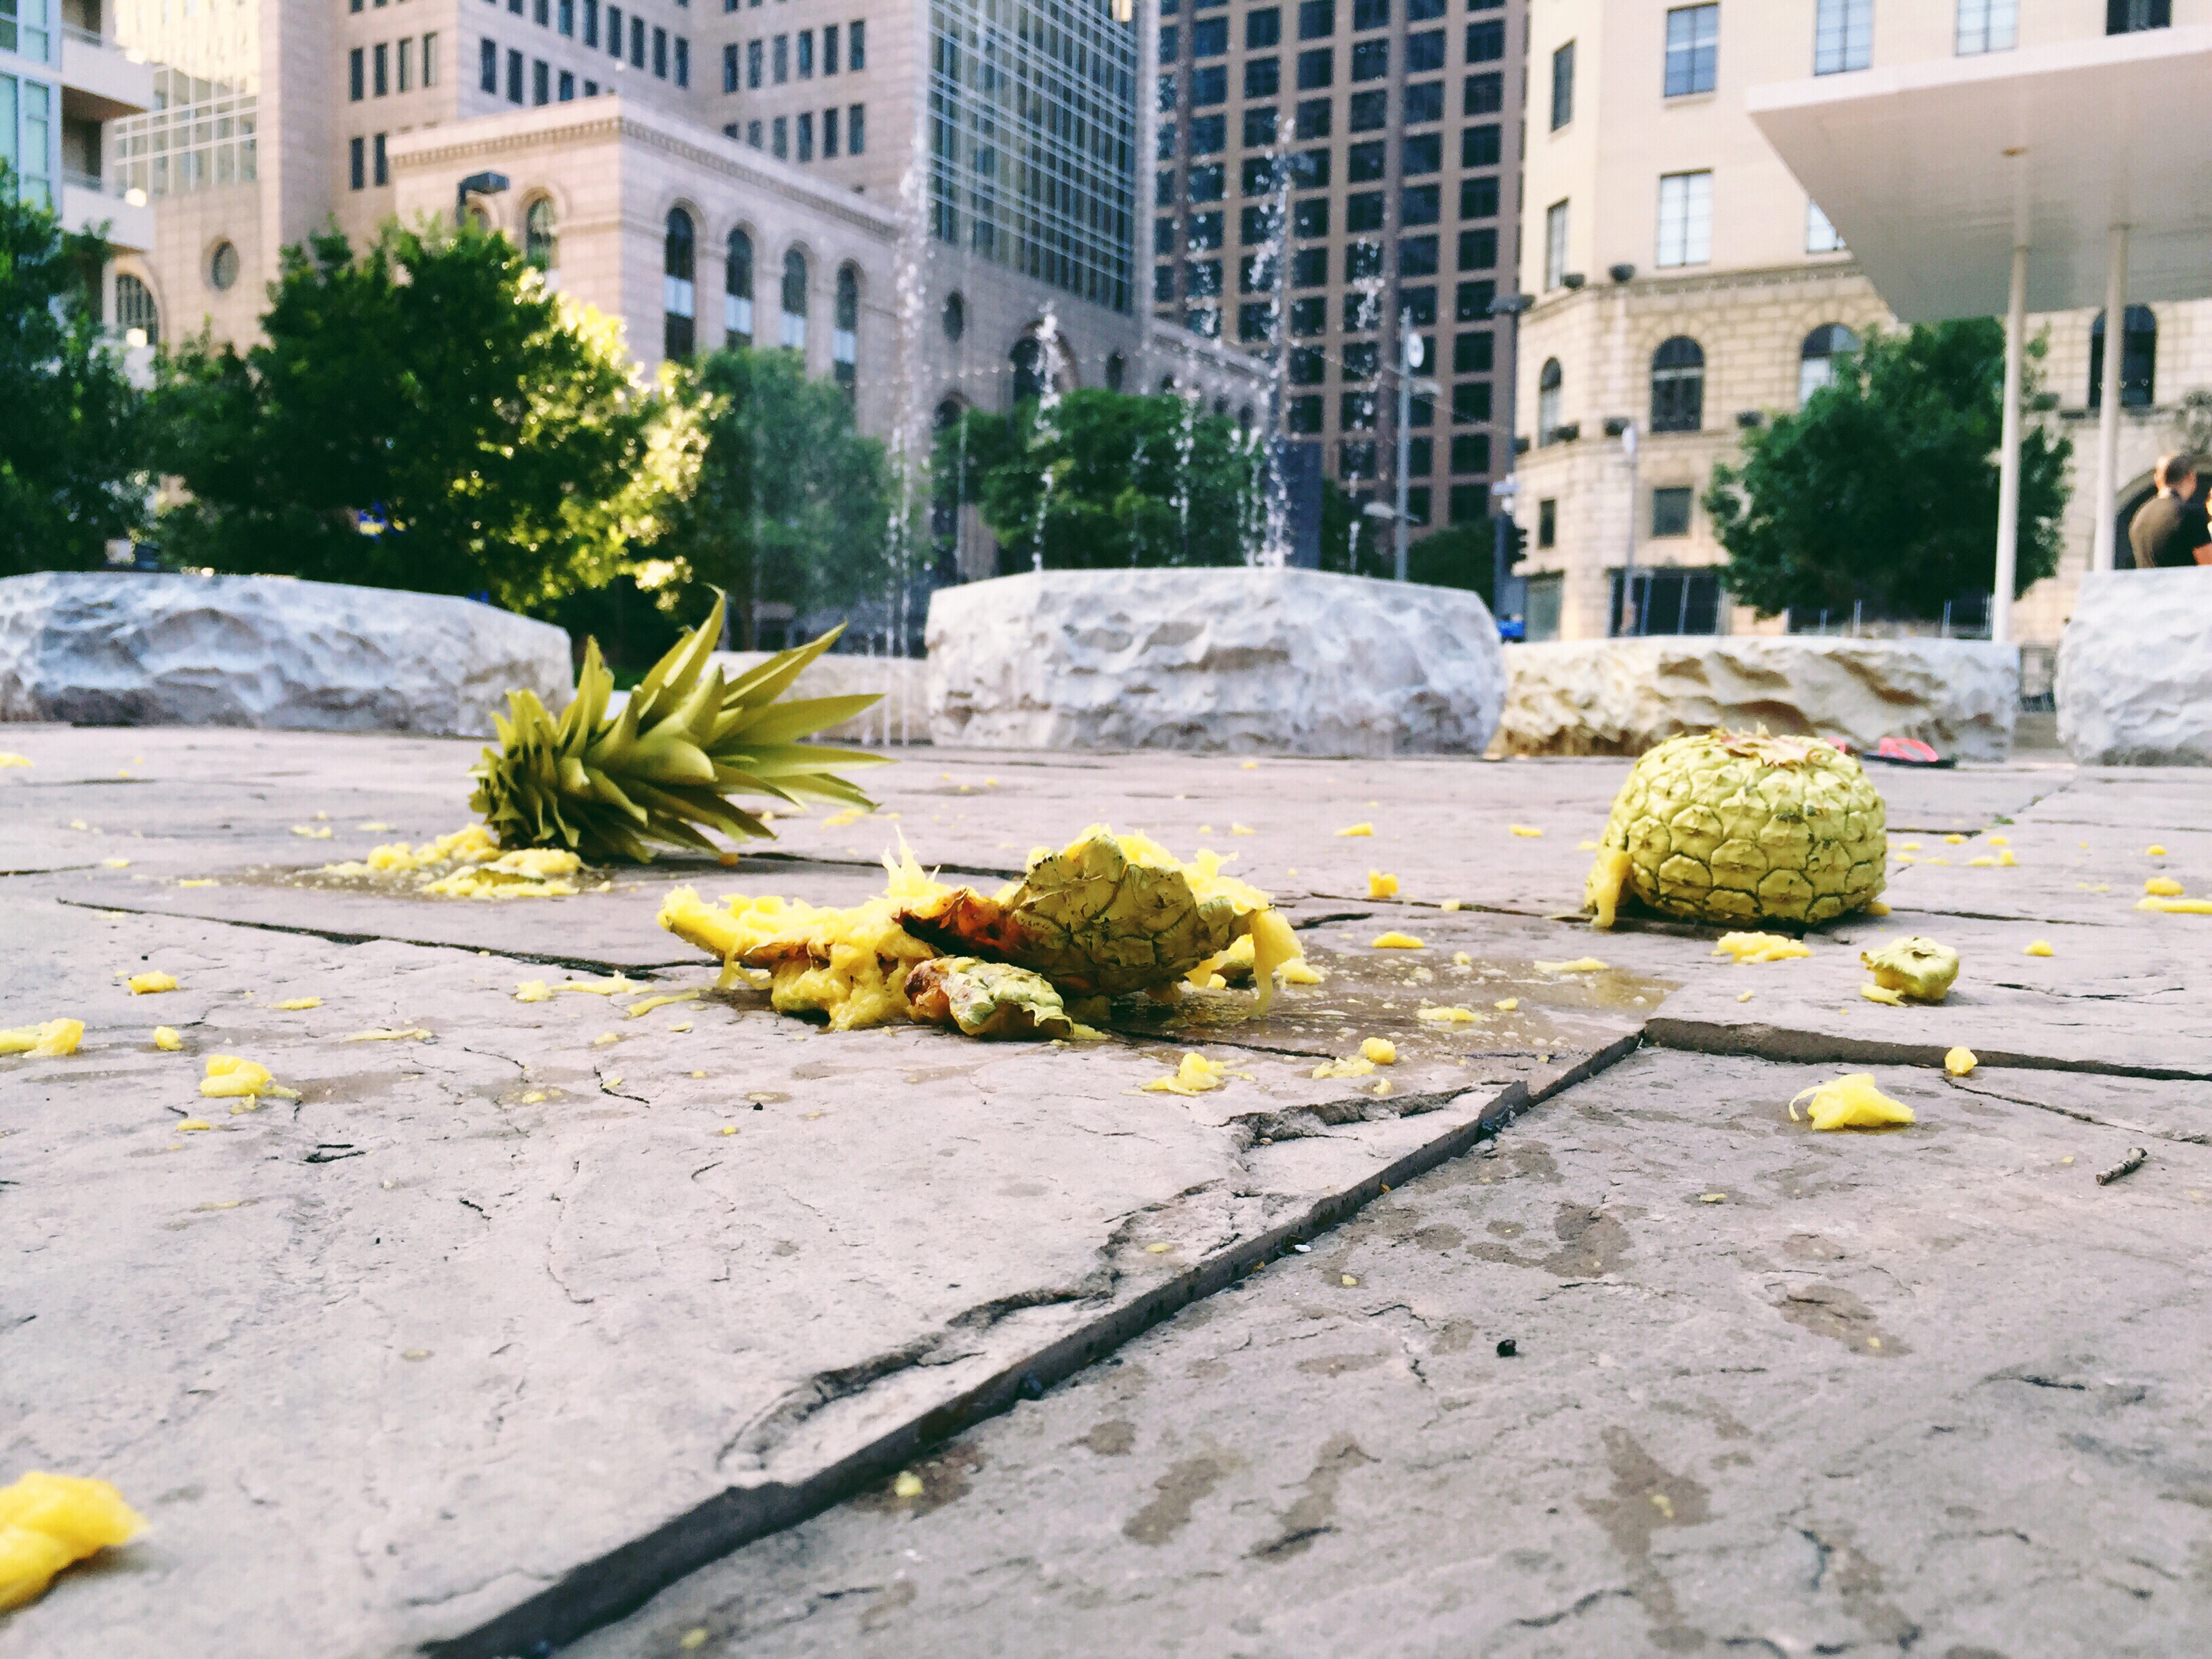 Fallen Pineapple, Architecture, Building, City, Construction, HQ Photo